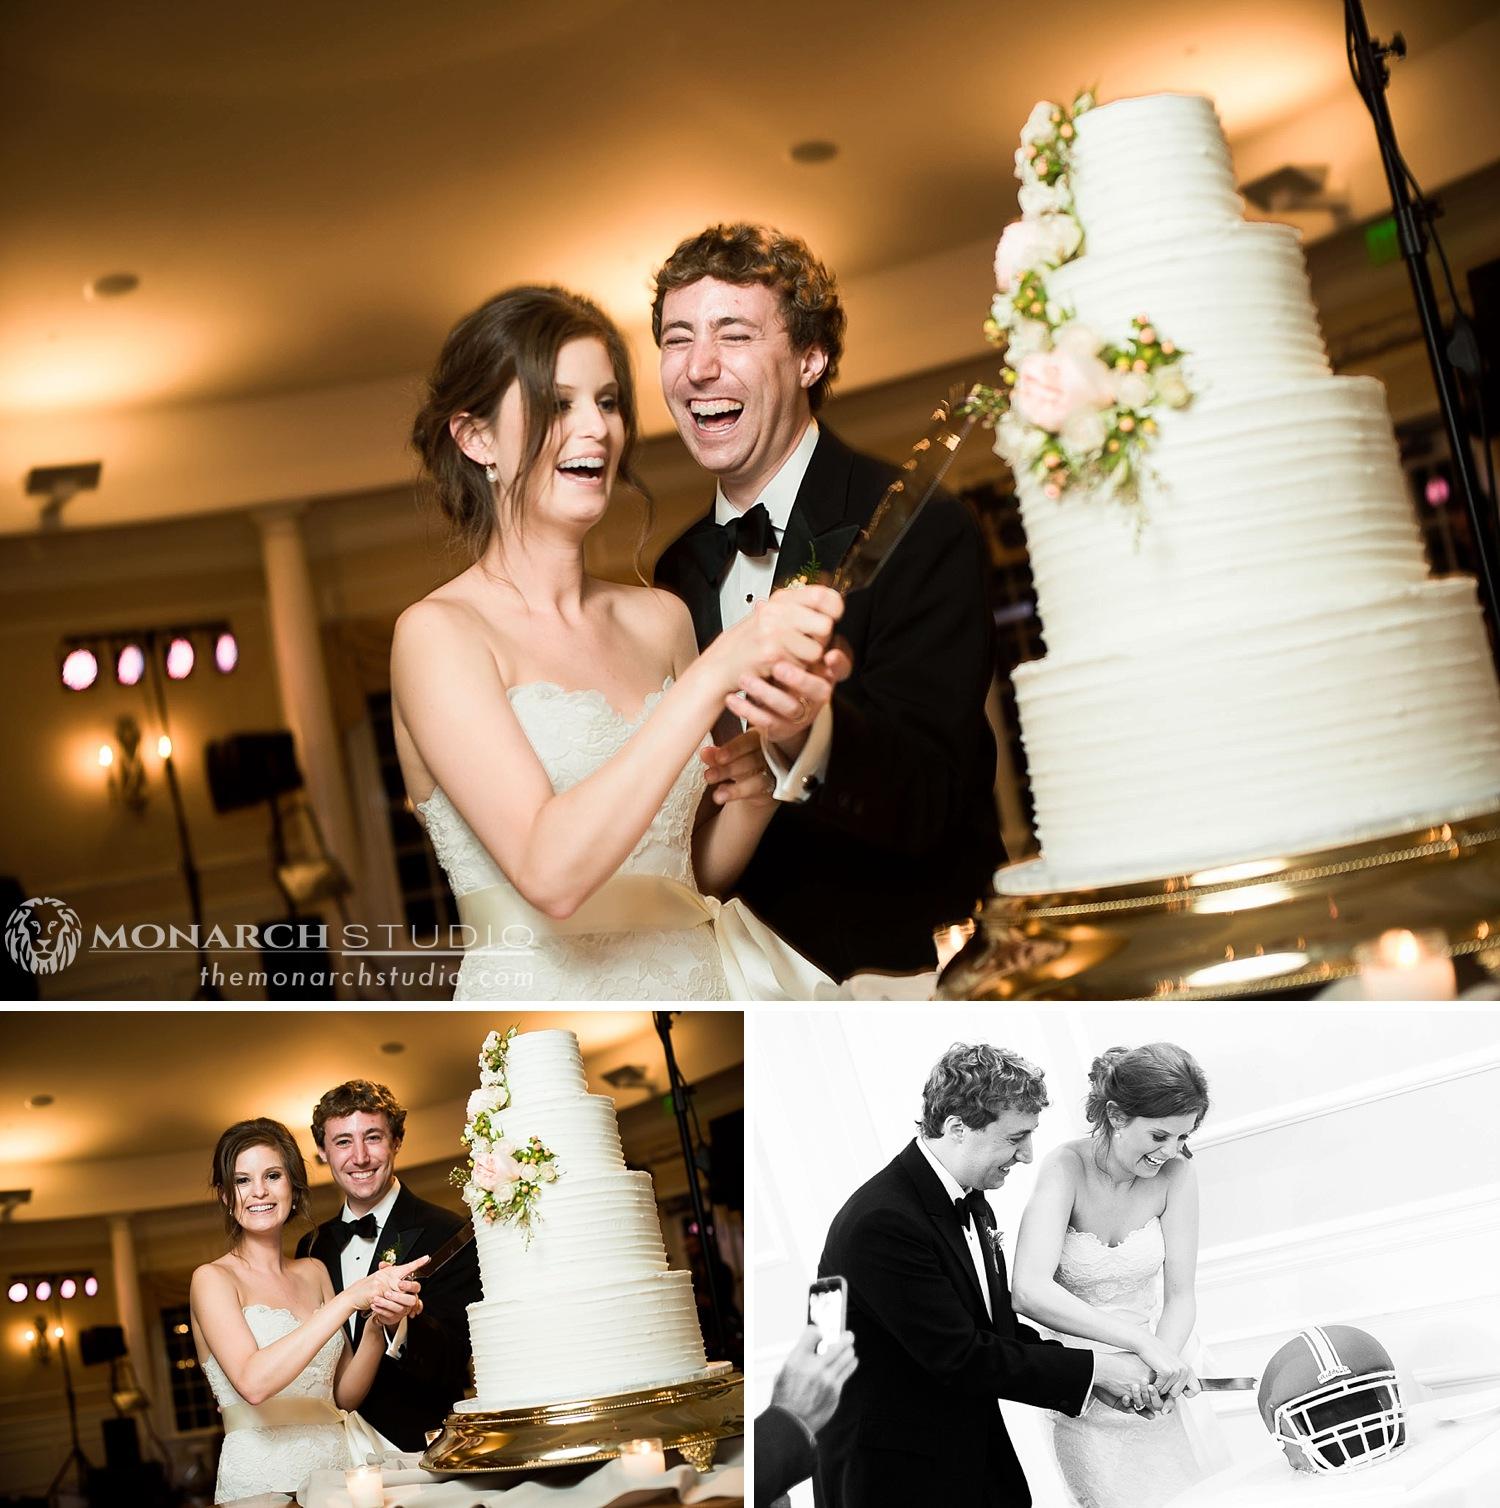 St-Augustine-Wedding-Photographer-Zach-Thomas-Riverhouse-Monarch-116.JPG